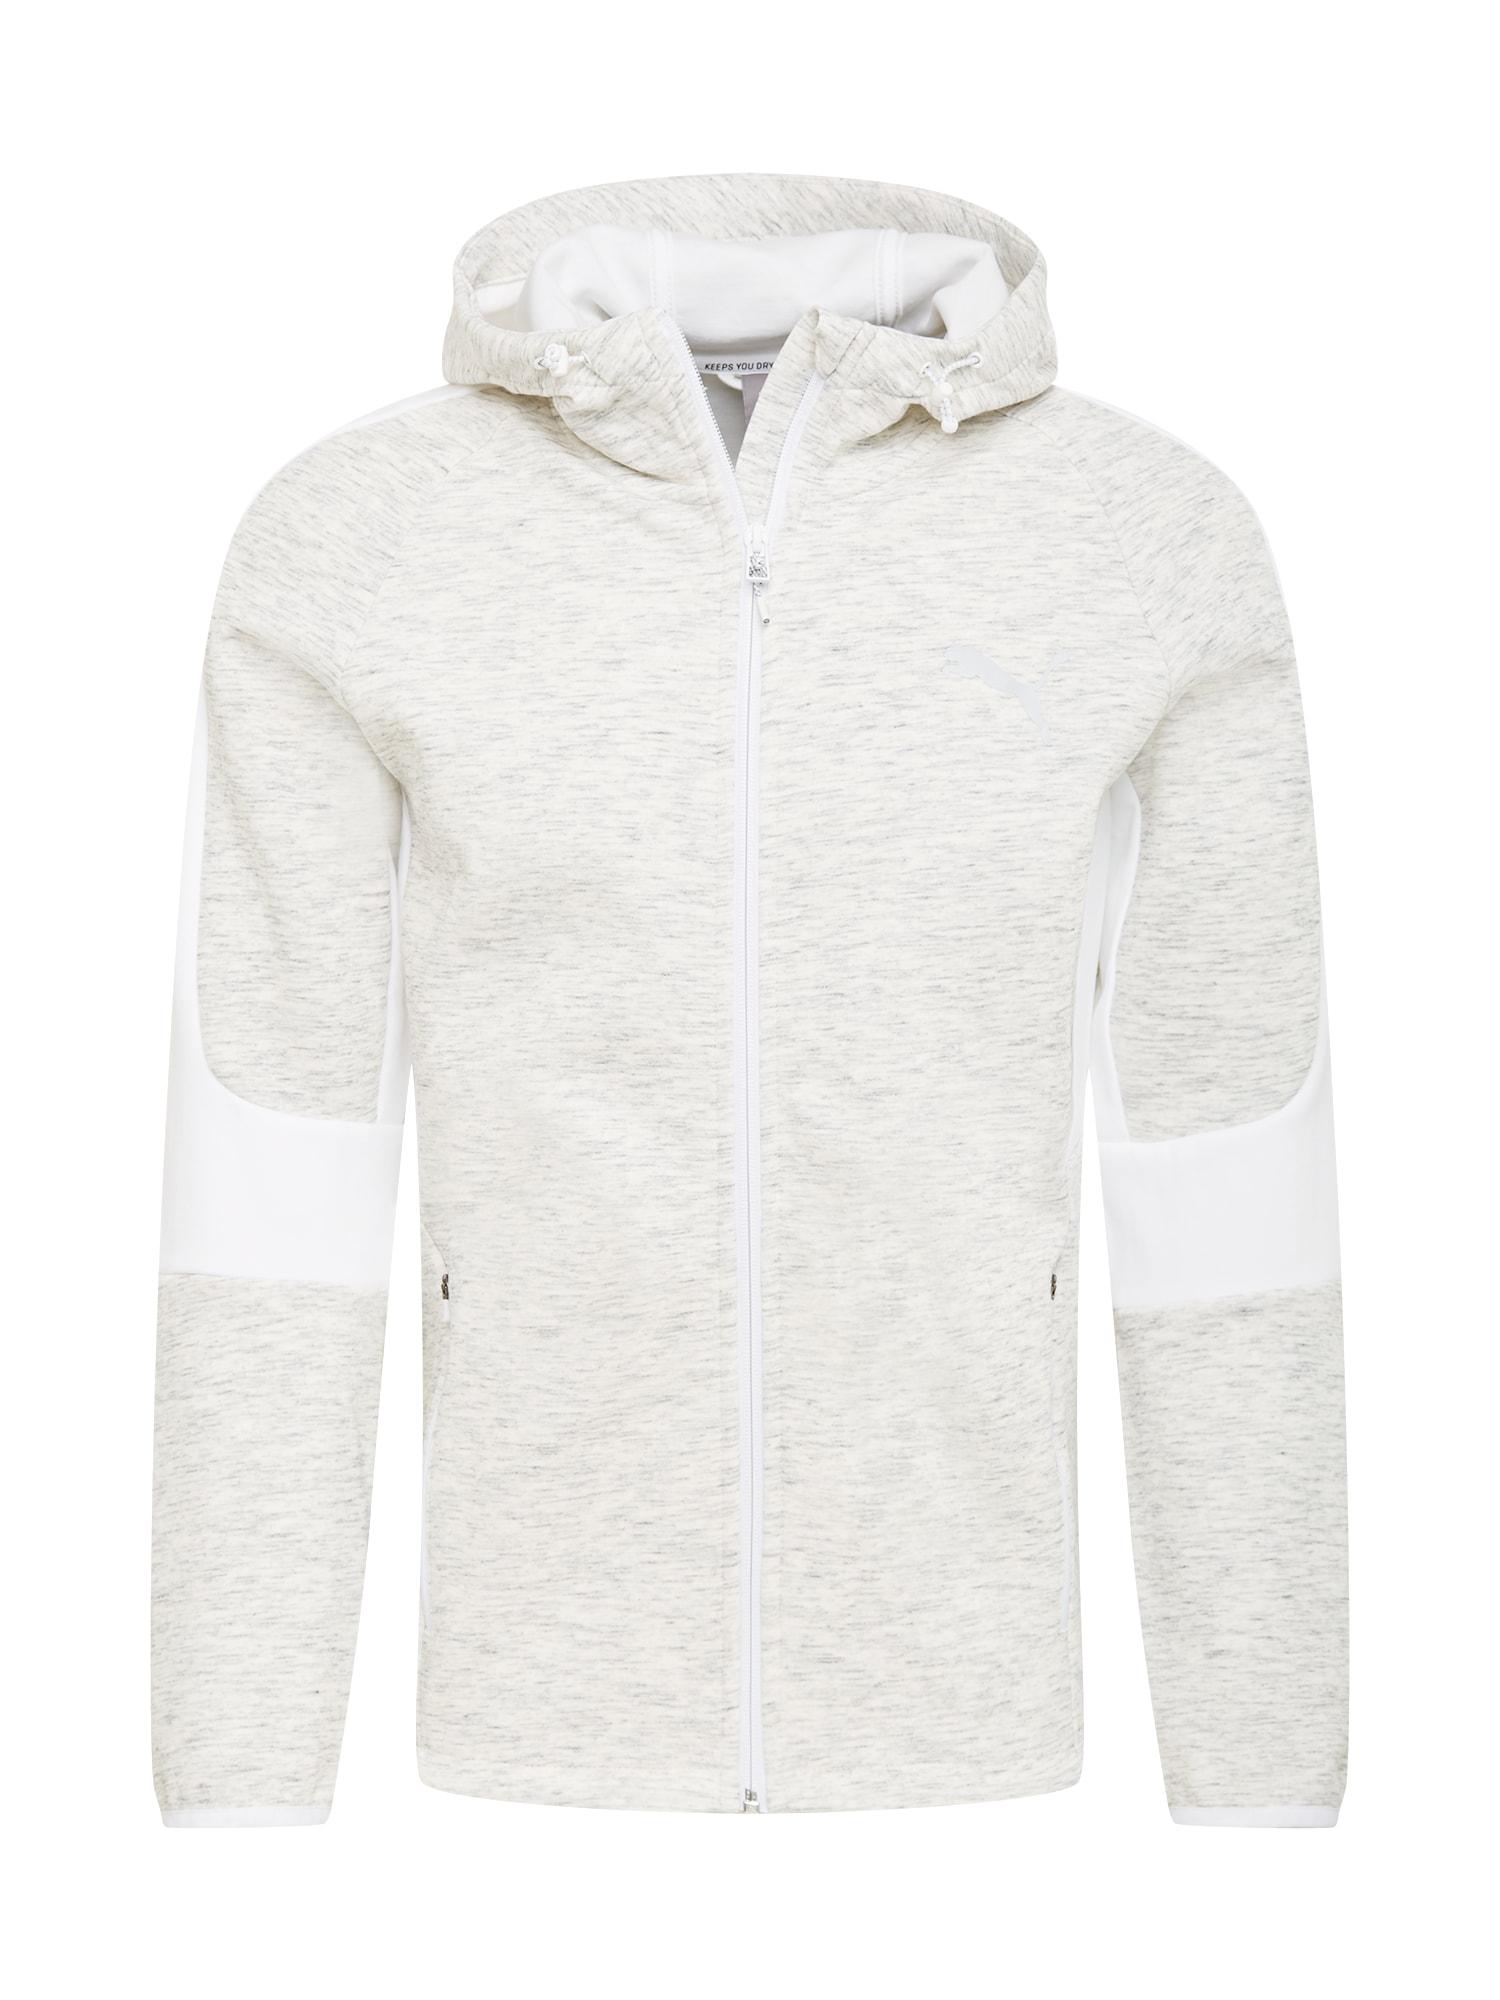 PUMA Sportinis džemperis balta / pilka